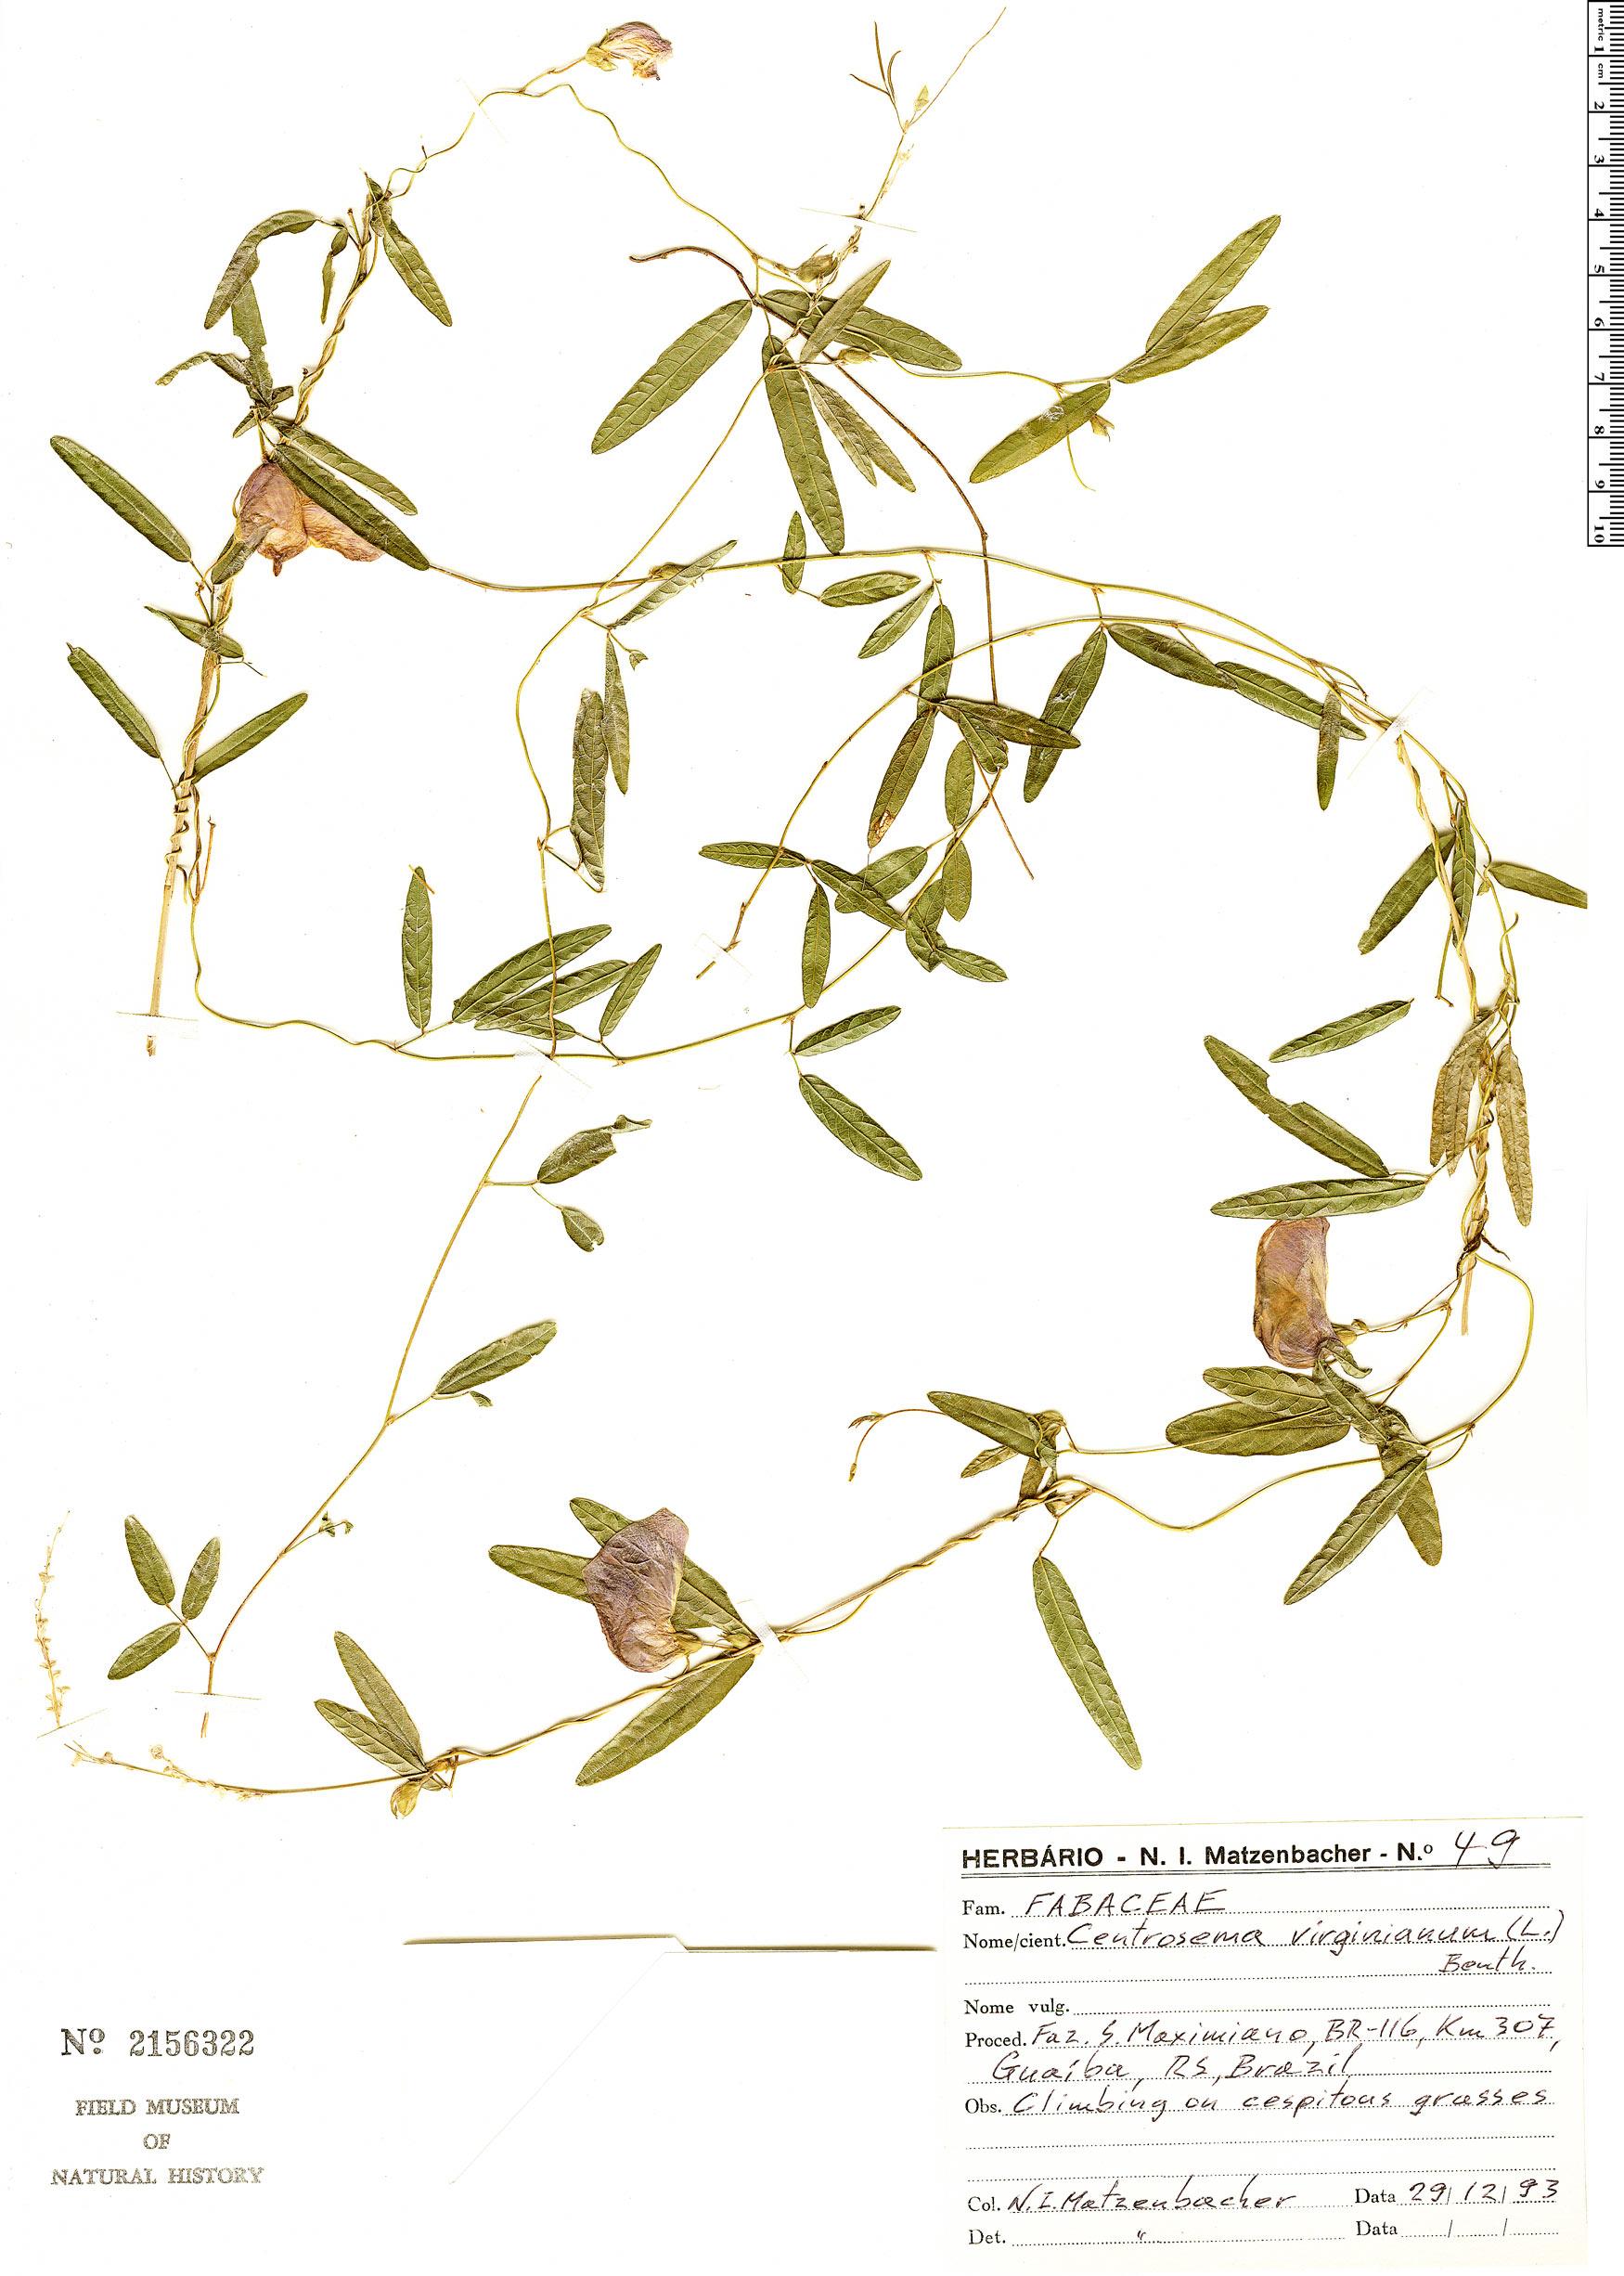 Specimen: Centrosema virginianum